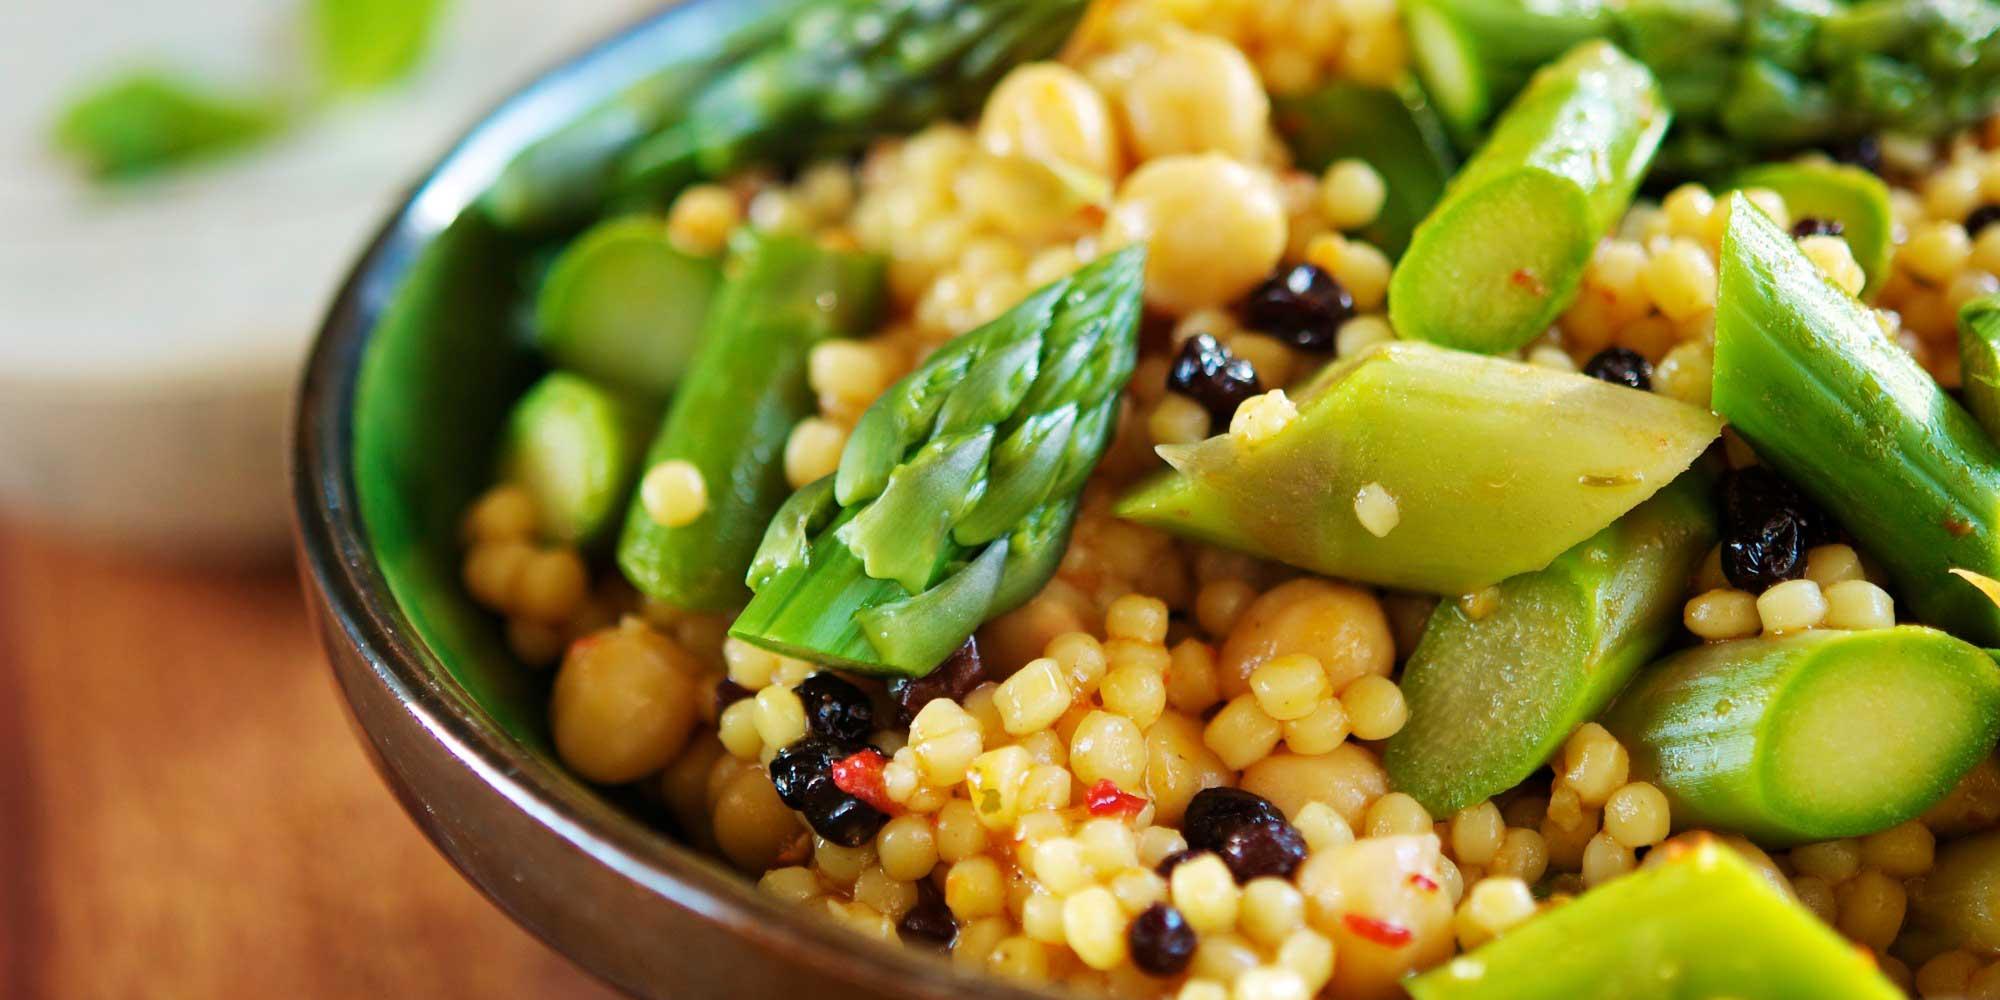 onemillionwlppr - vejetaryen yemekleri